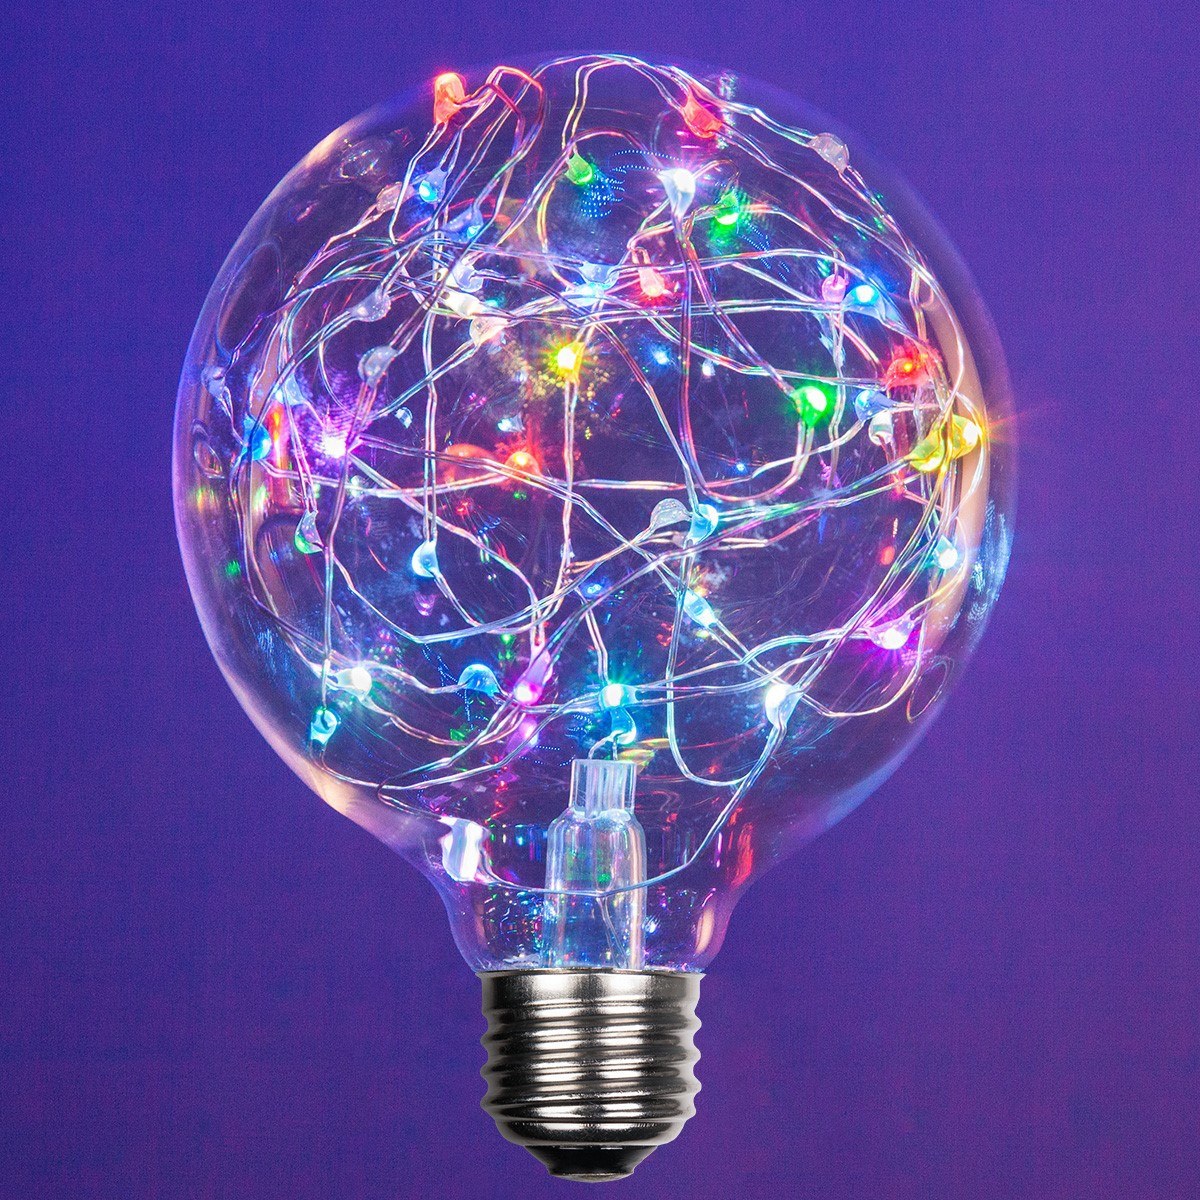 G95 Color Change Rgb Ledimagine Tm Fairy Light Bulb